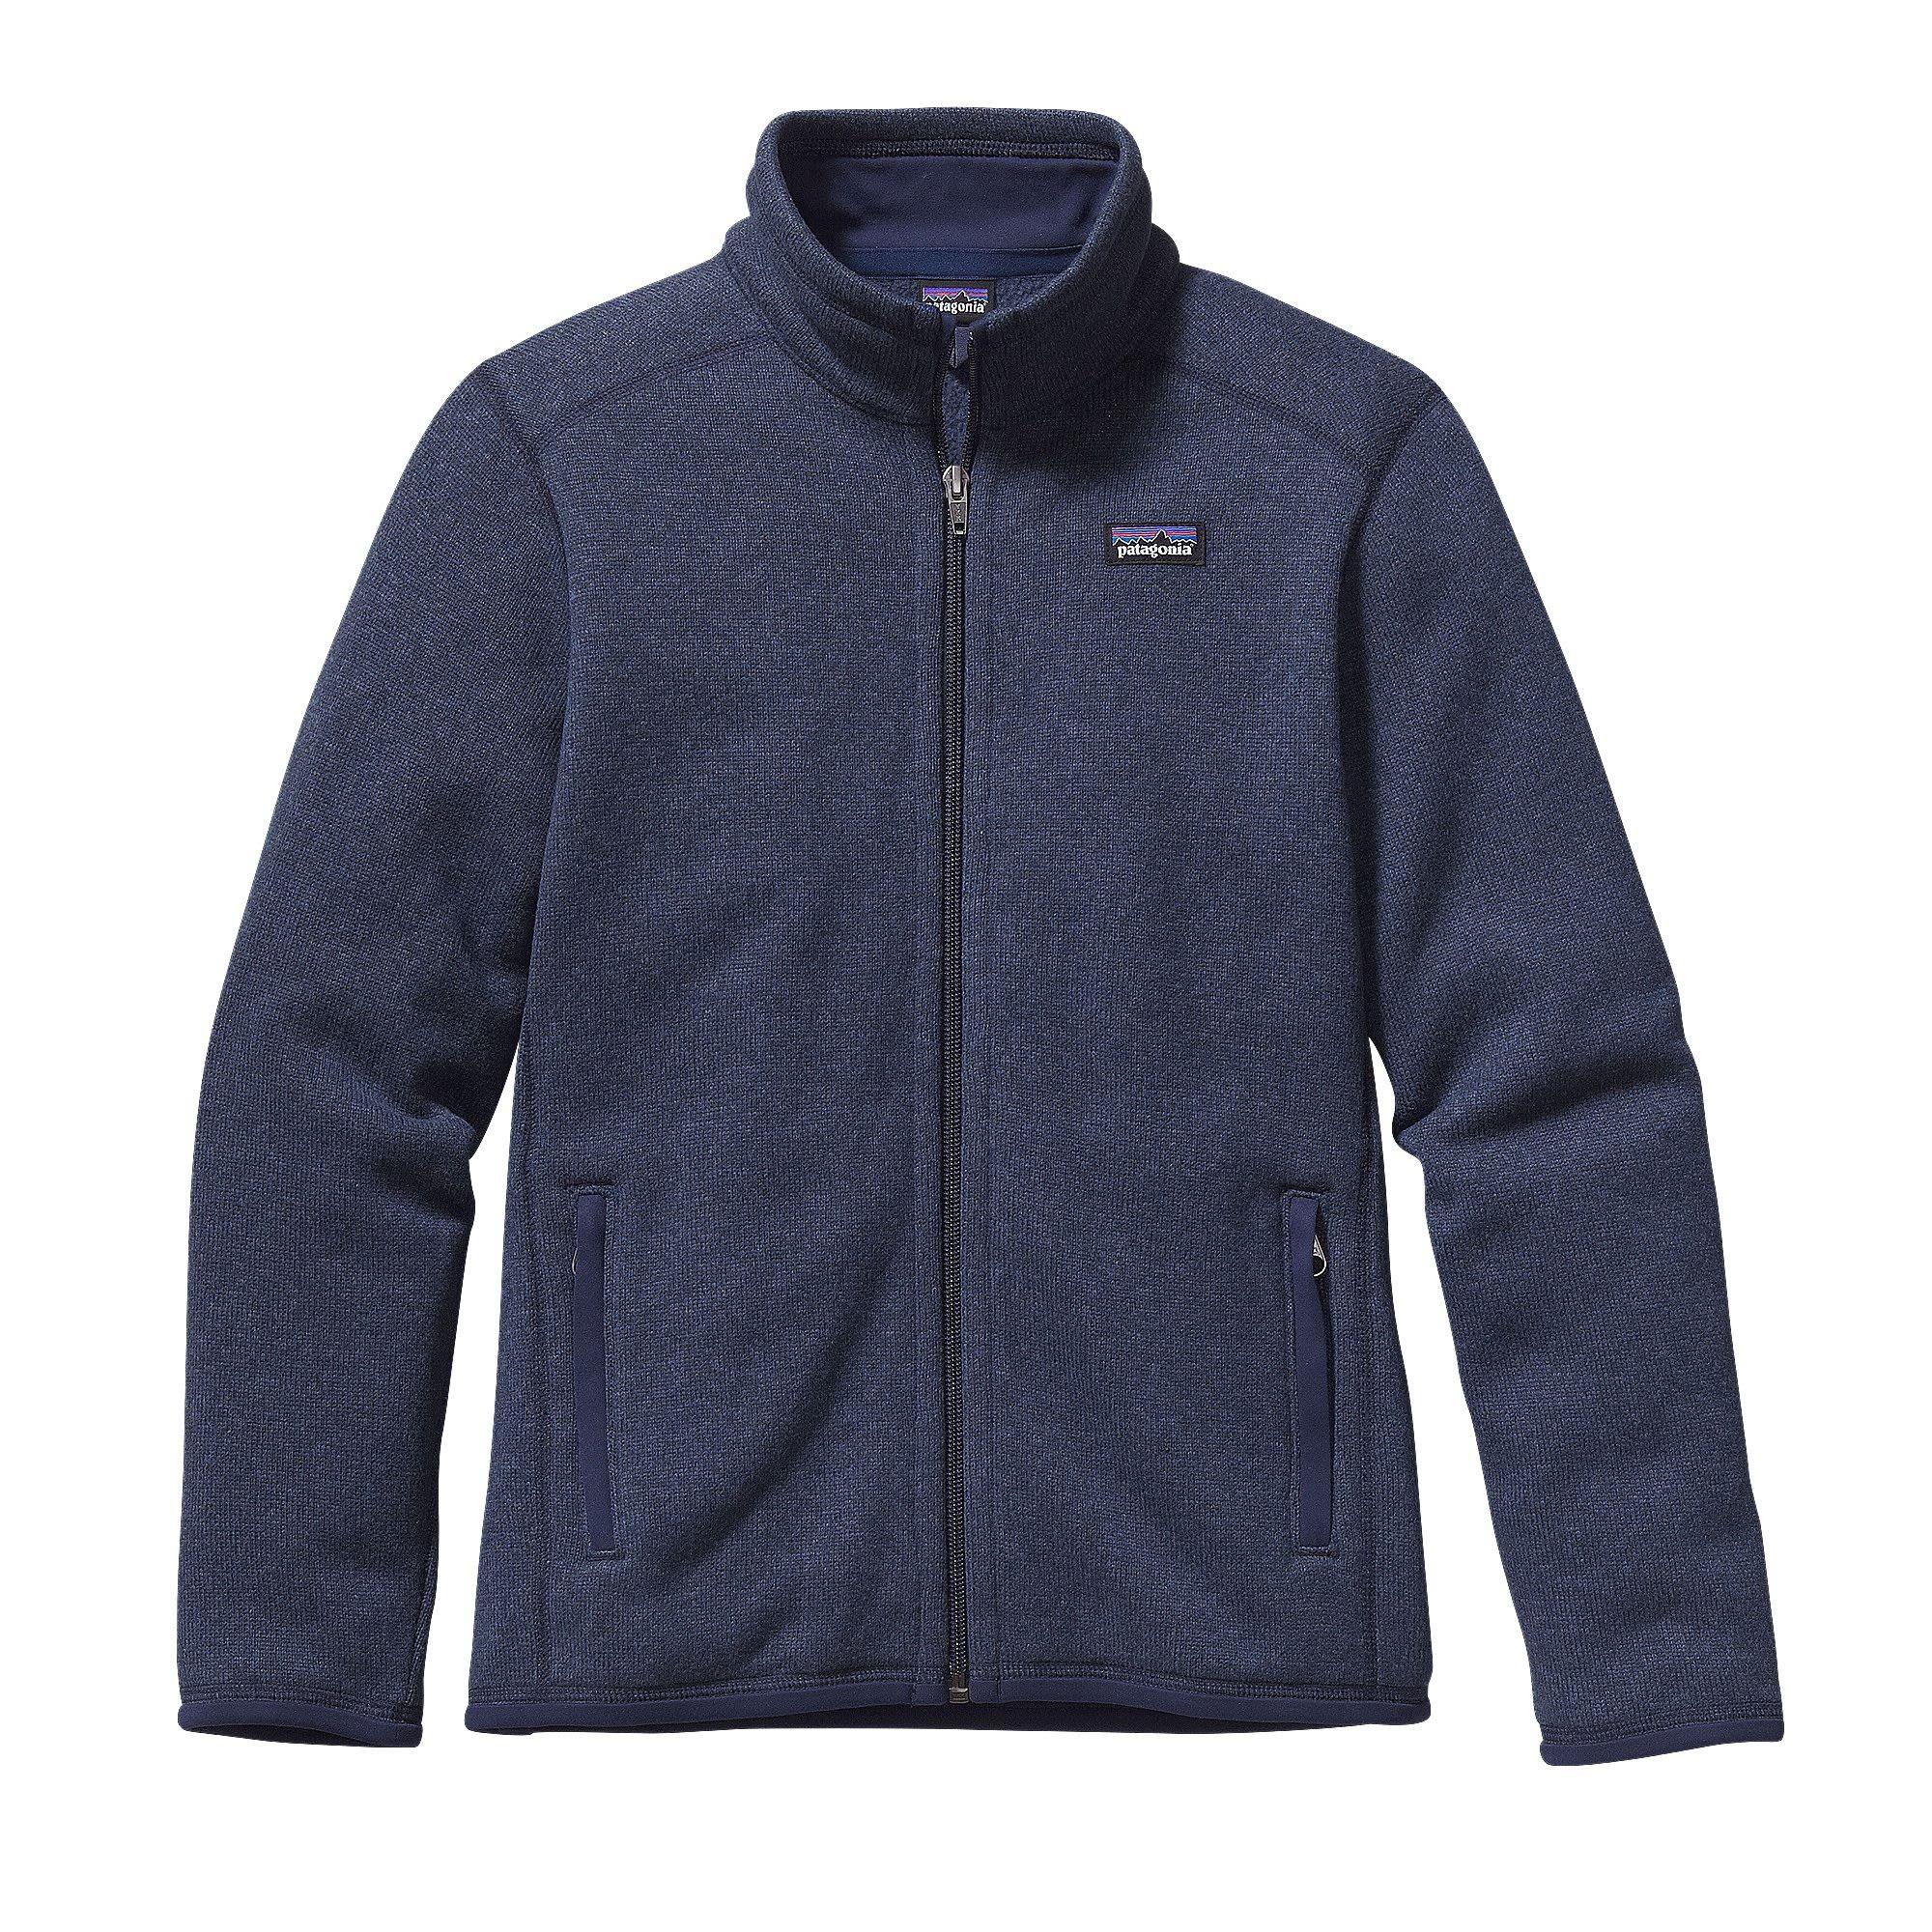 Patagonia Boys Better Sweater Jacket   Größe XS,S,M   Kinder Fleecejacke